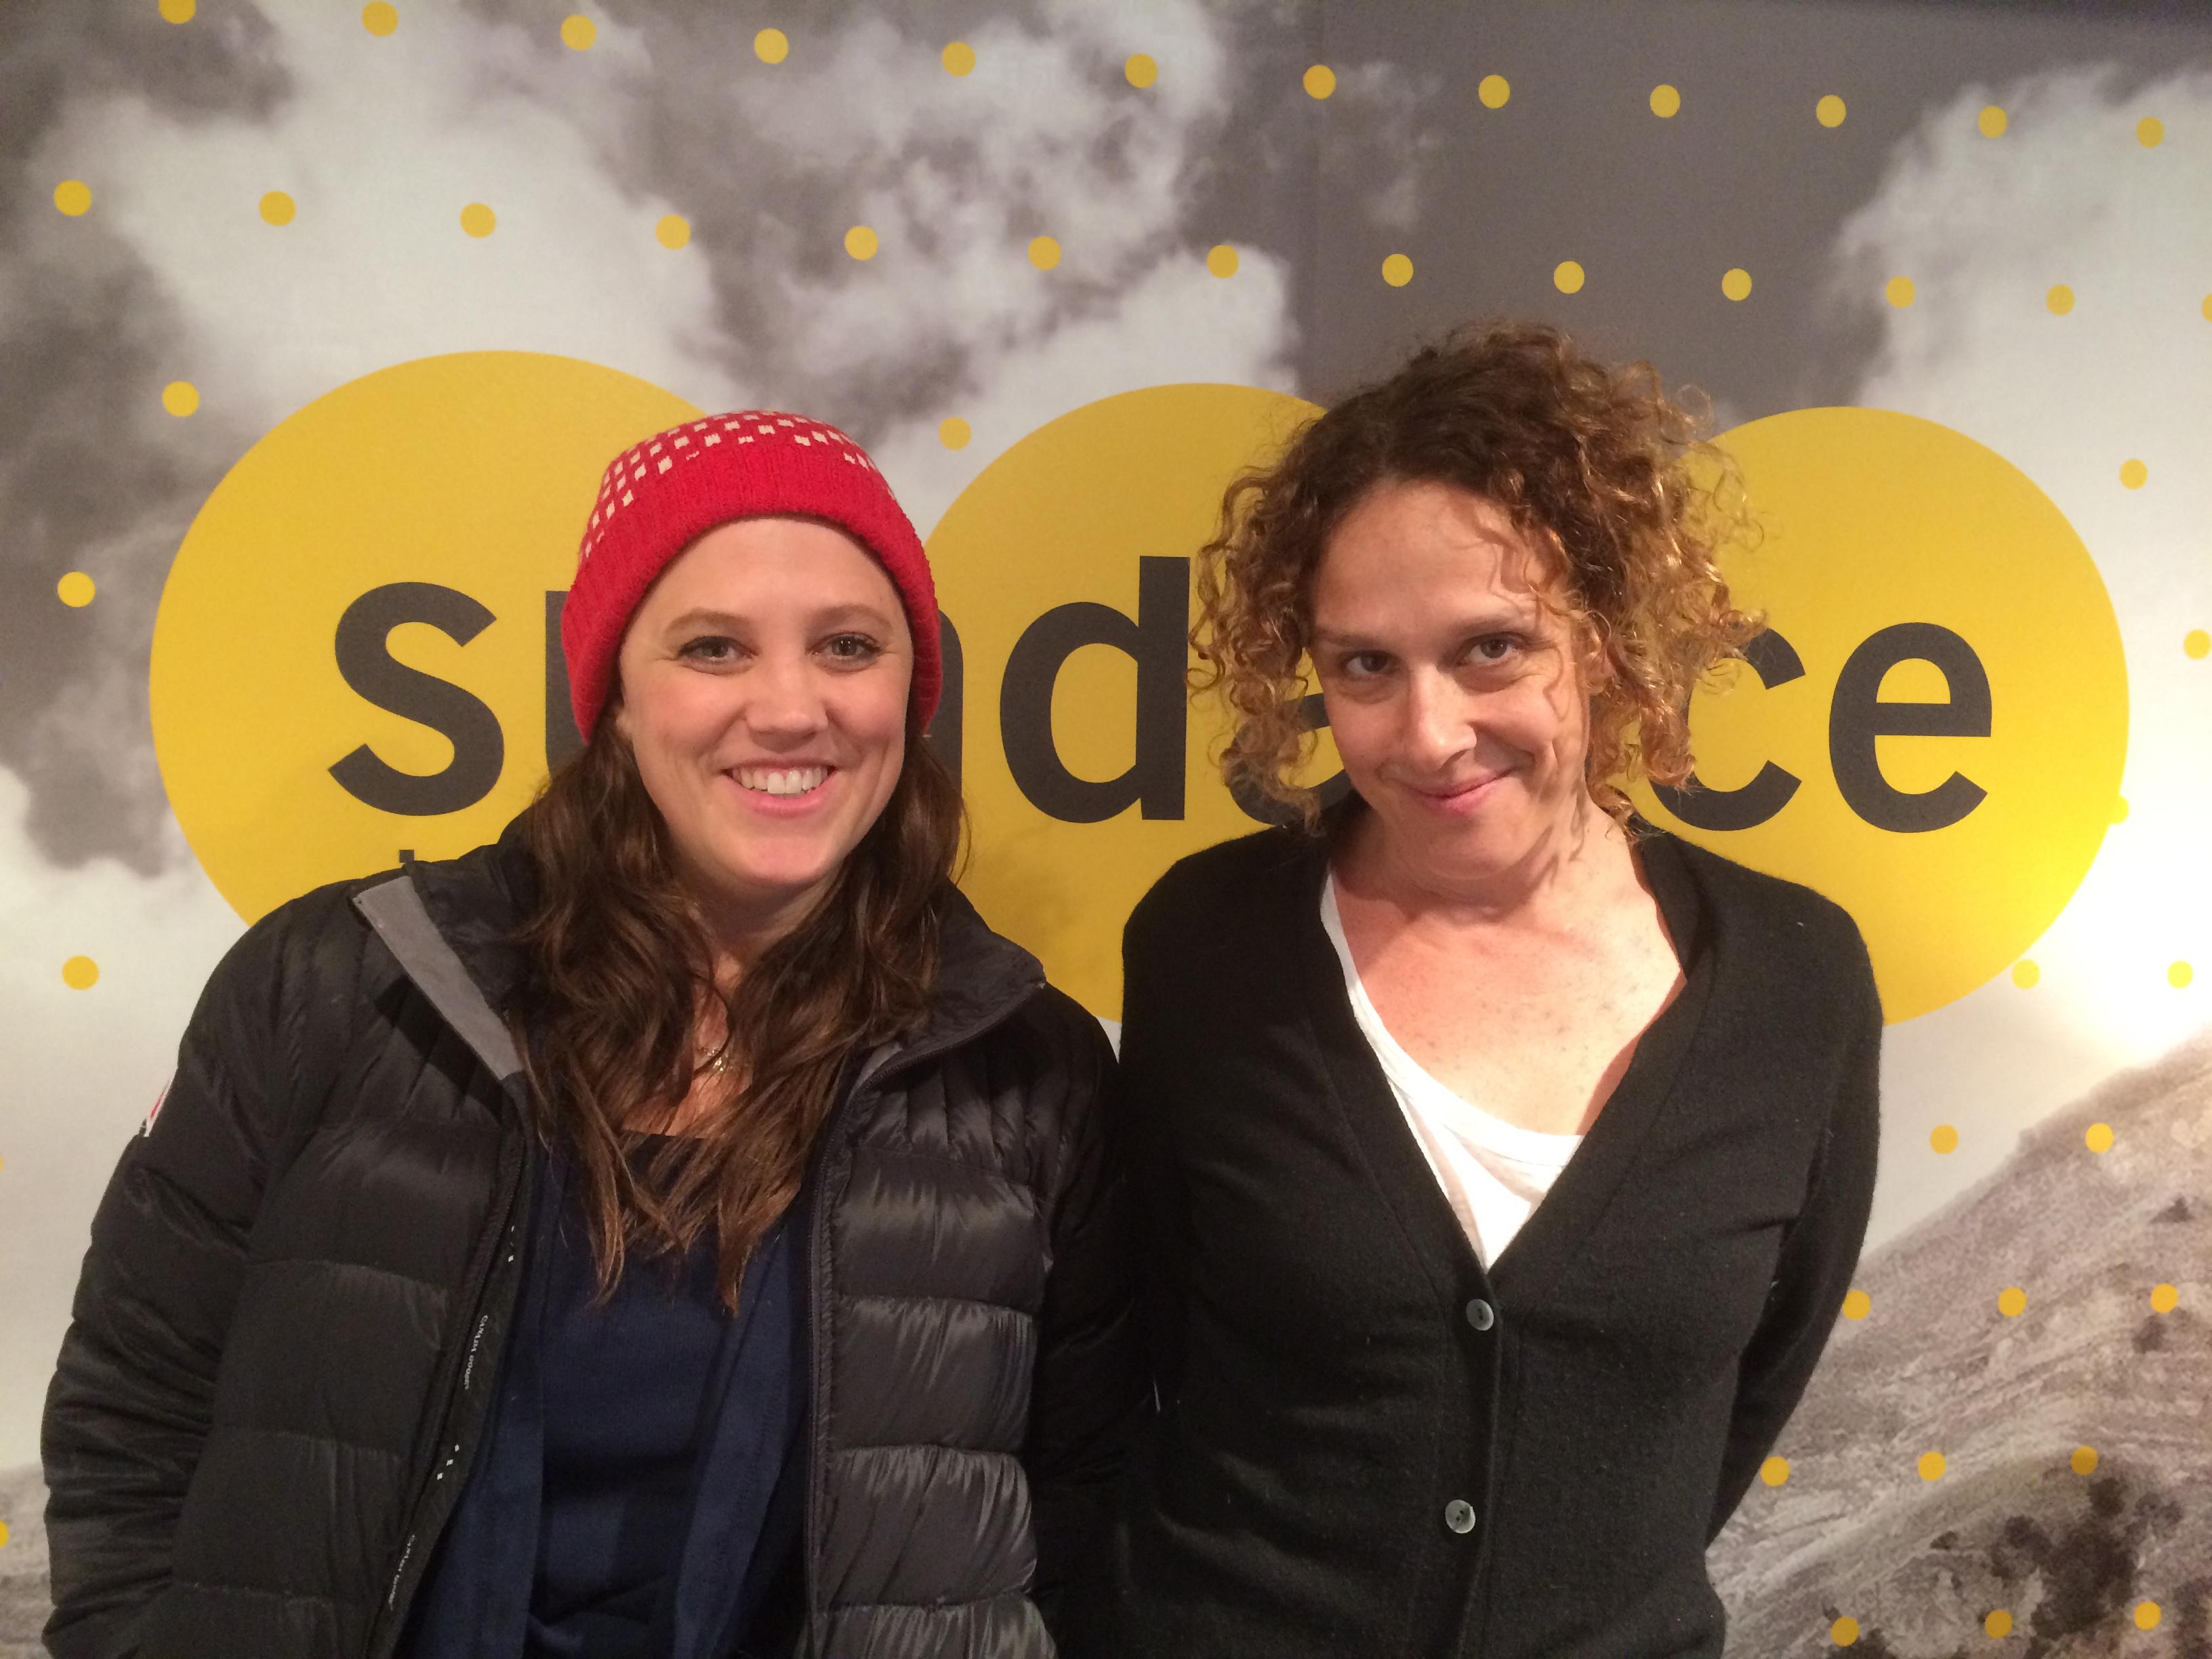 Heidi Ewing and Rachel Grady